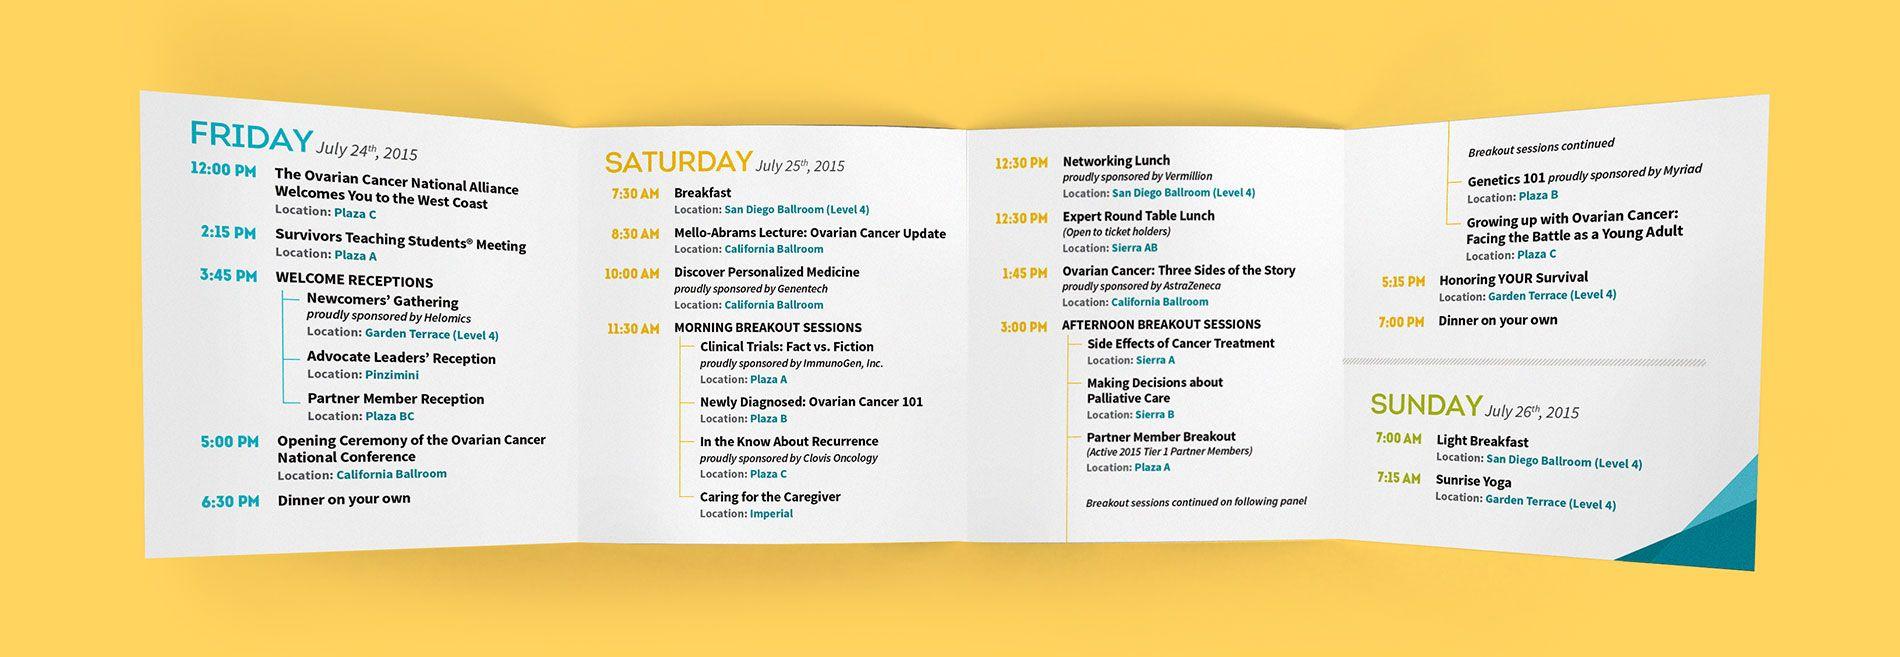 Interior Design Of The Pocket Agenda  Corporate Event Planning